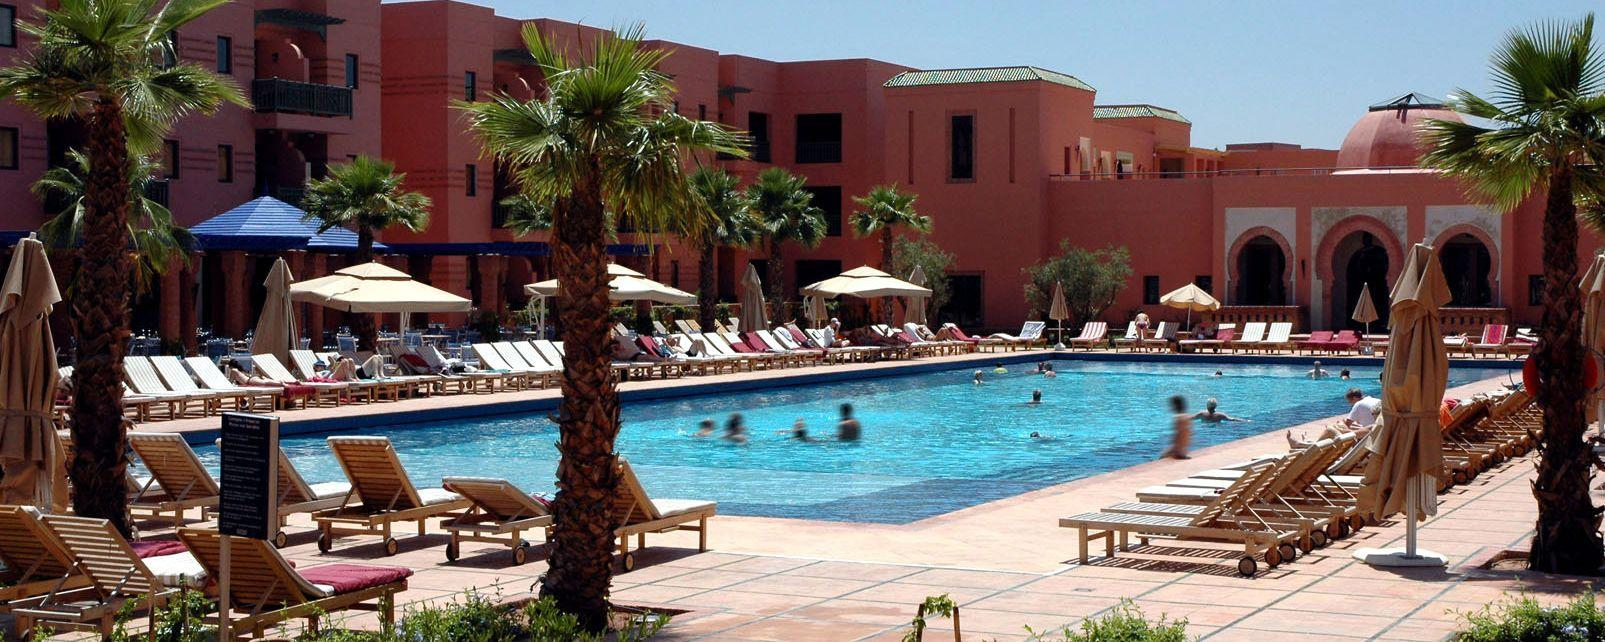 Hôtel Les Jardins De L'agdal Marrakech - Marrakech ... dedans Les Jardins De L Agdal Hotel & Spa